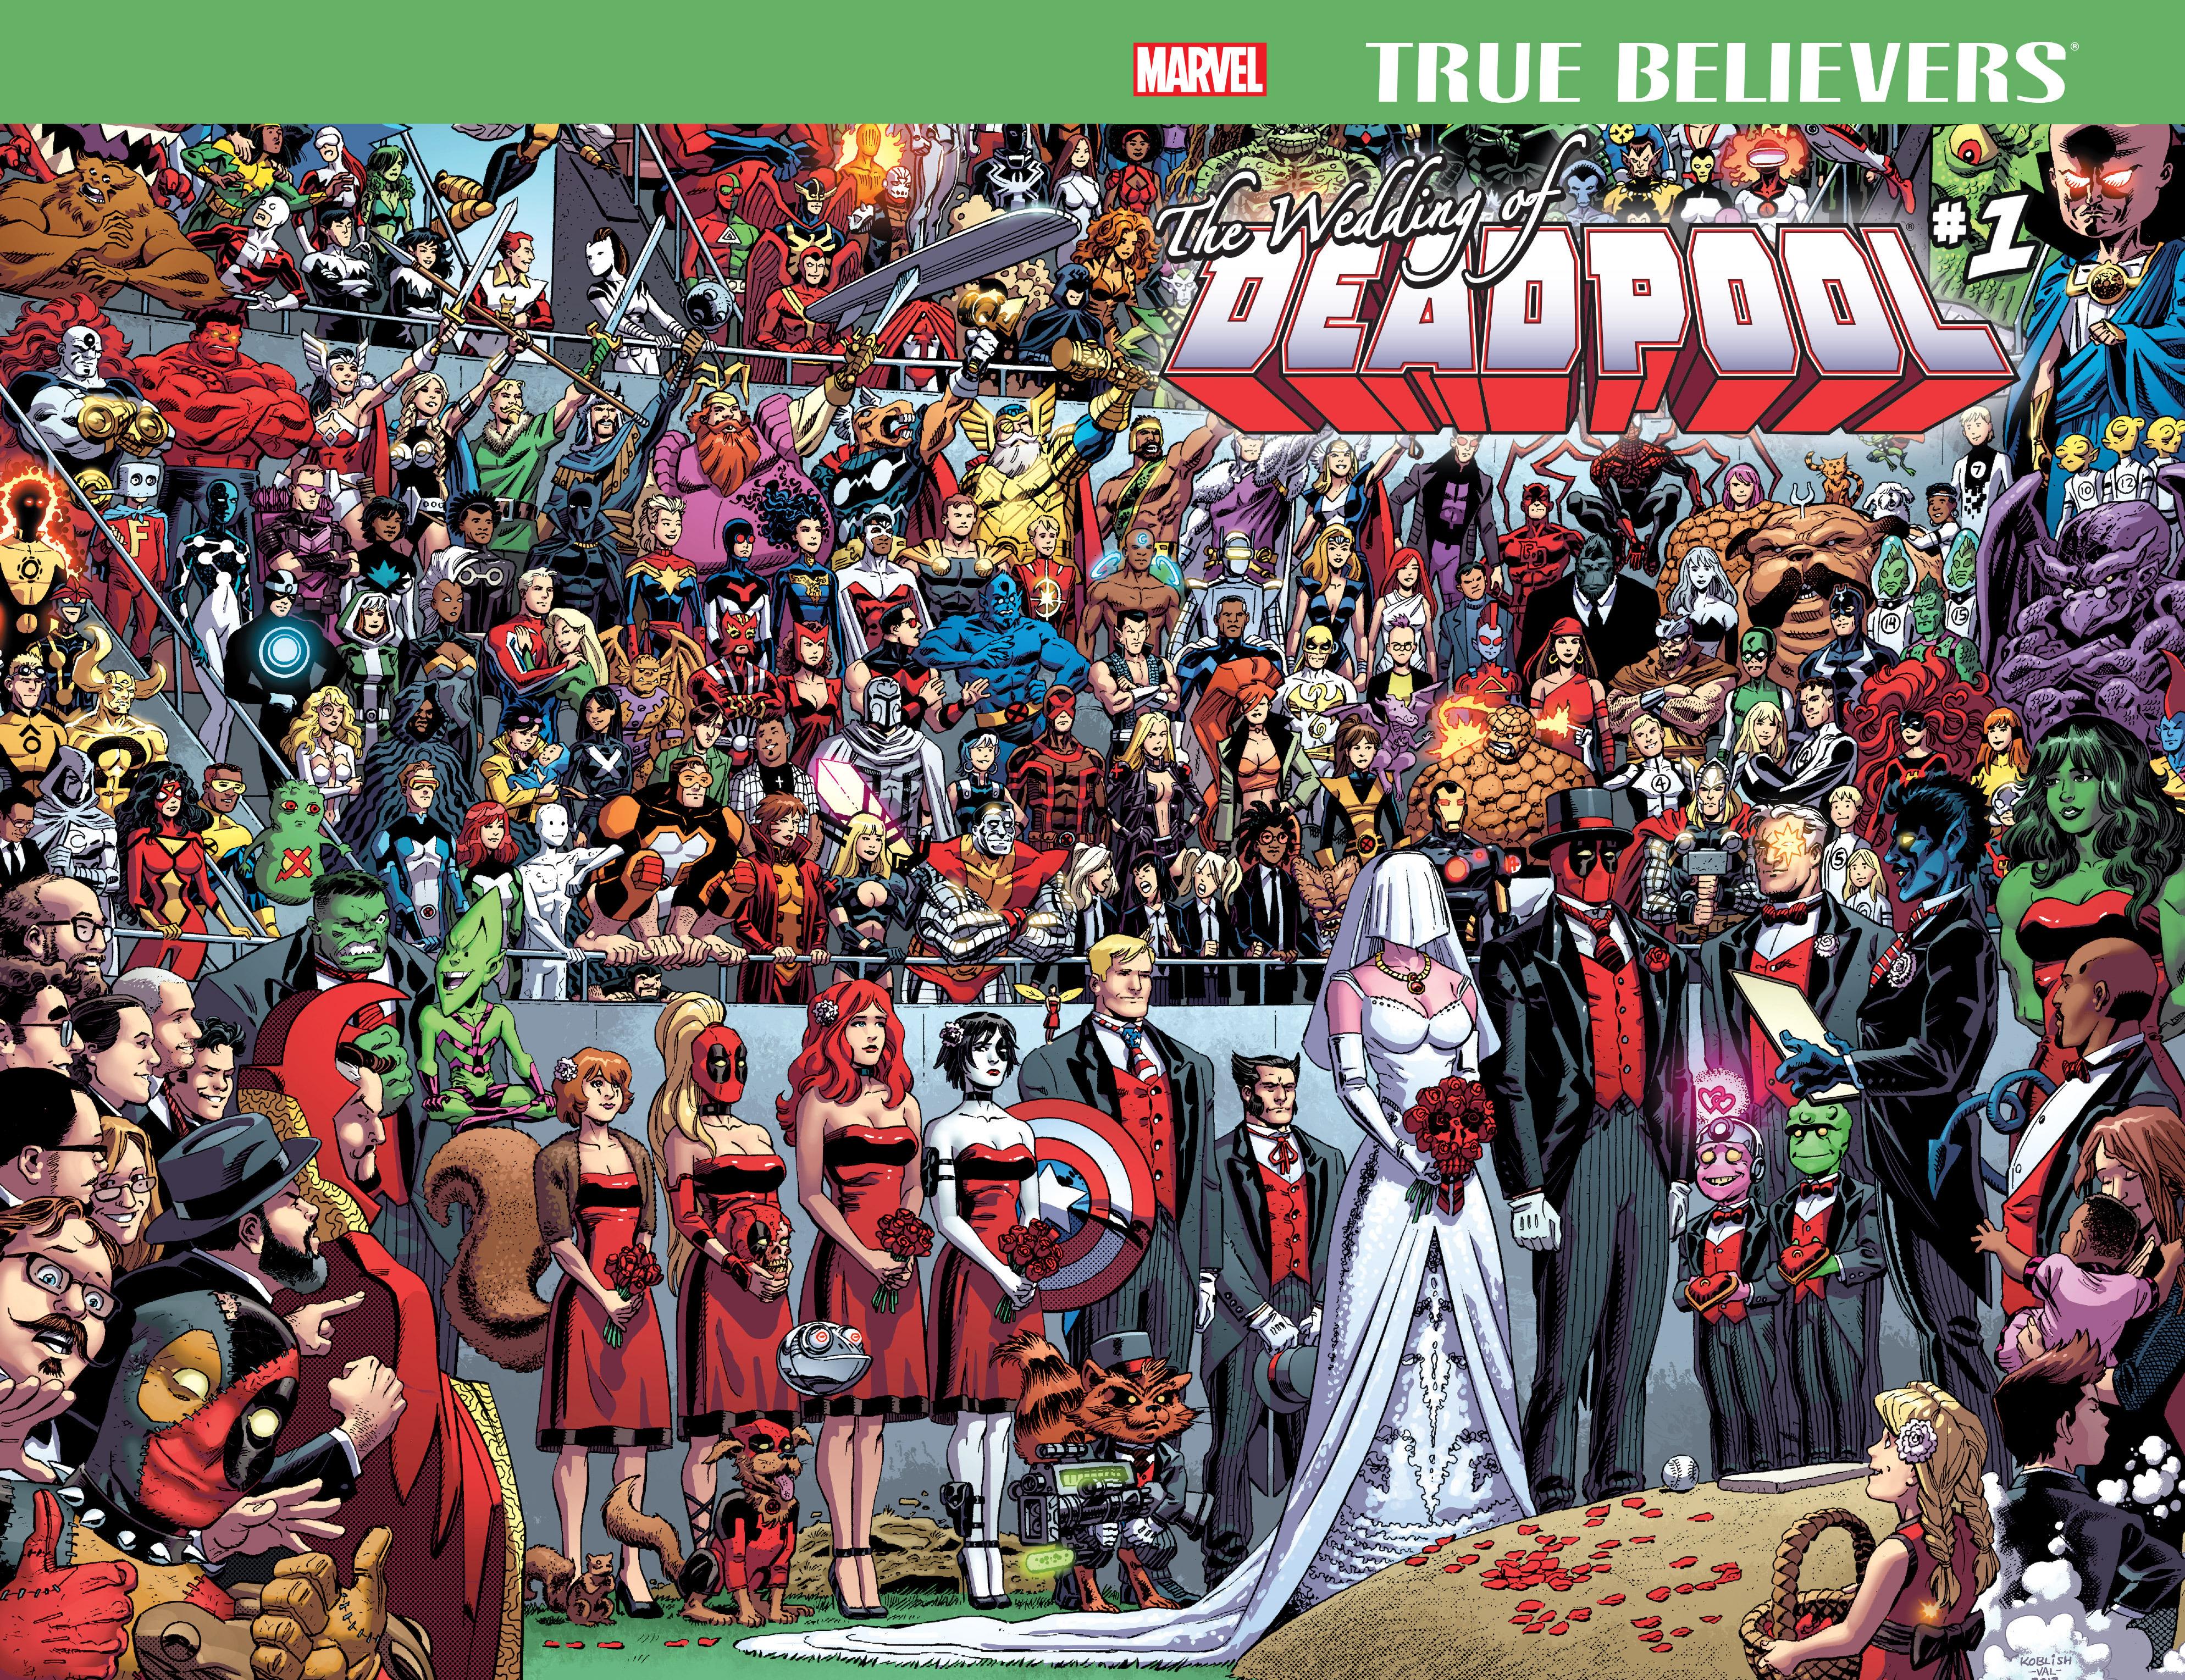 Read online True Believers: The Wedding of Deadpool comic -  Issue # Full - 2